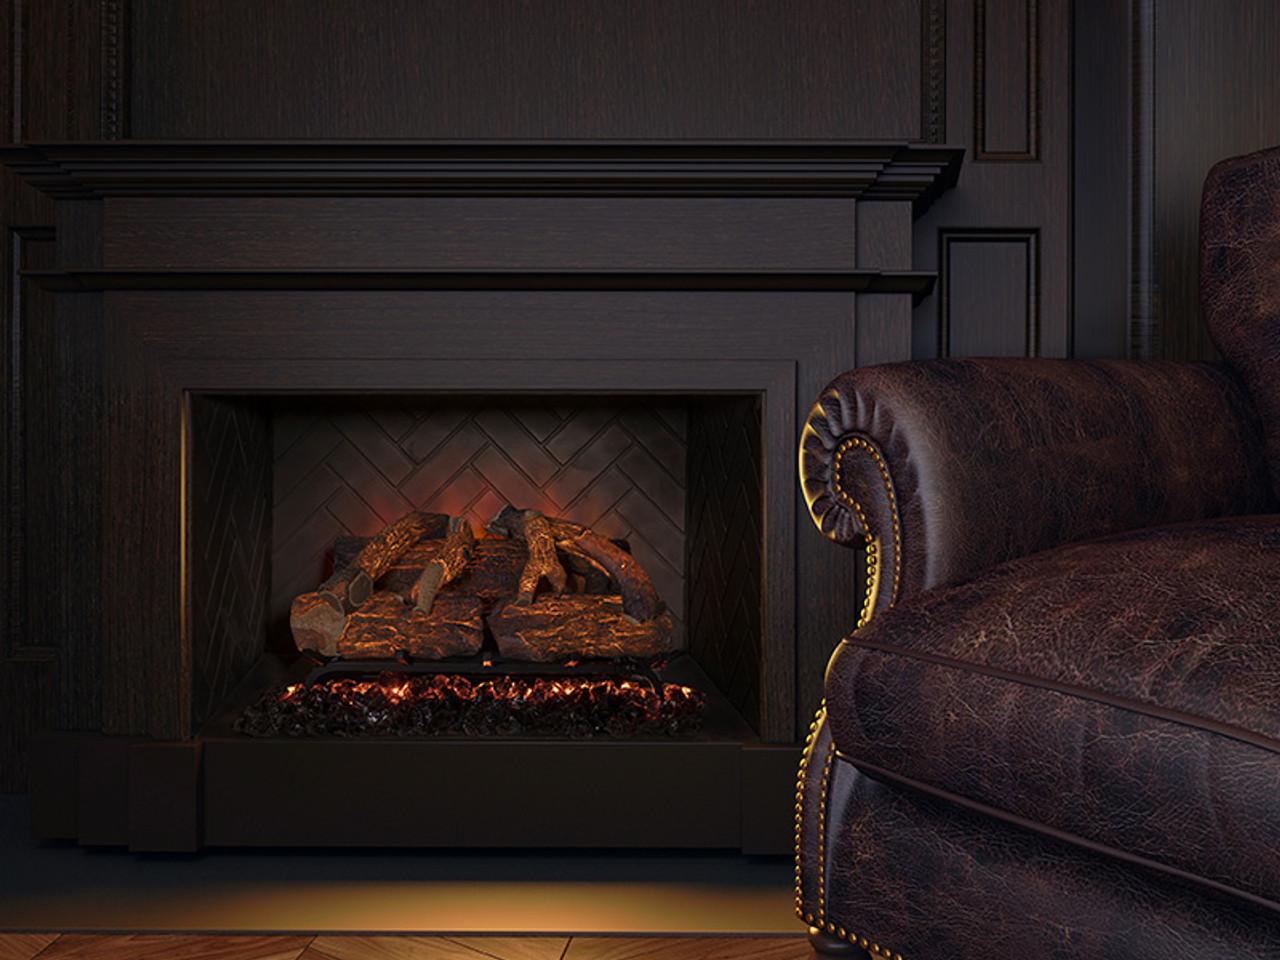 Peachy Sunset Charred Oak Electric Log Set Modern Flames W Optional Battery Sco 26El Interior Design Ideas Gentotryabchikinfo